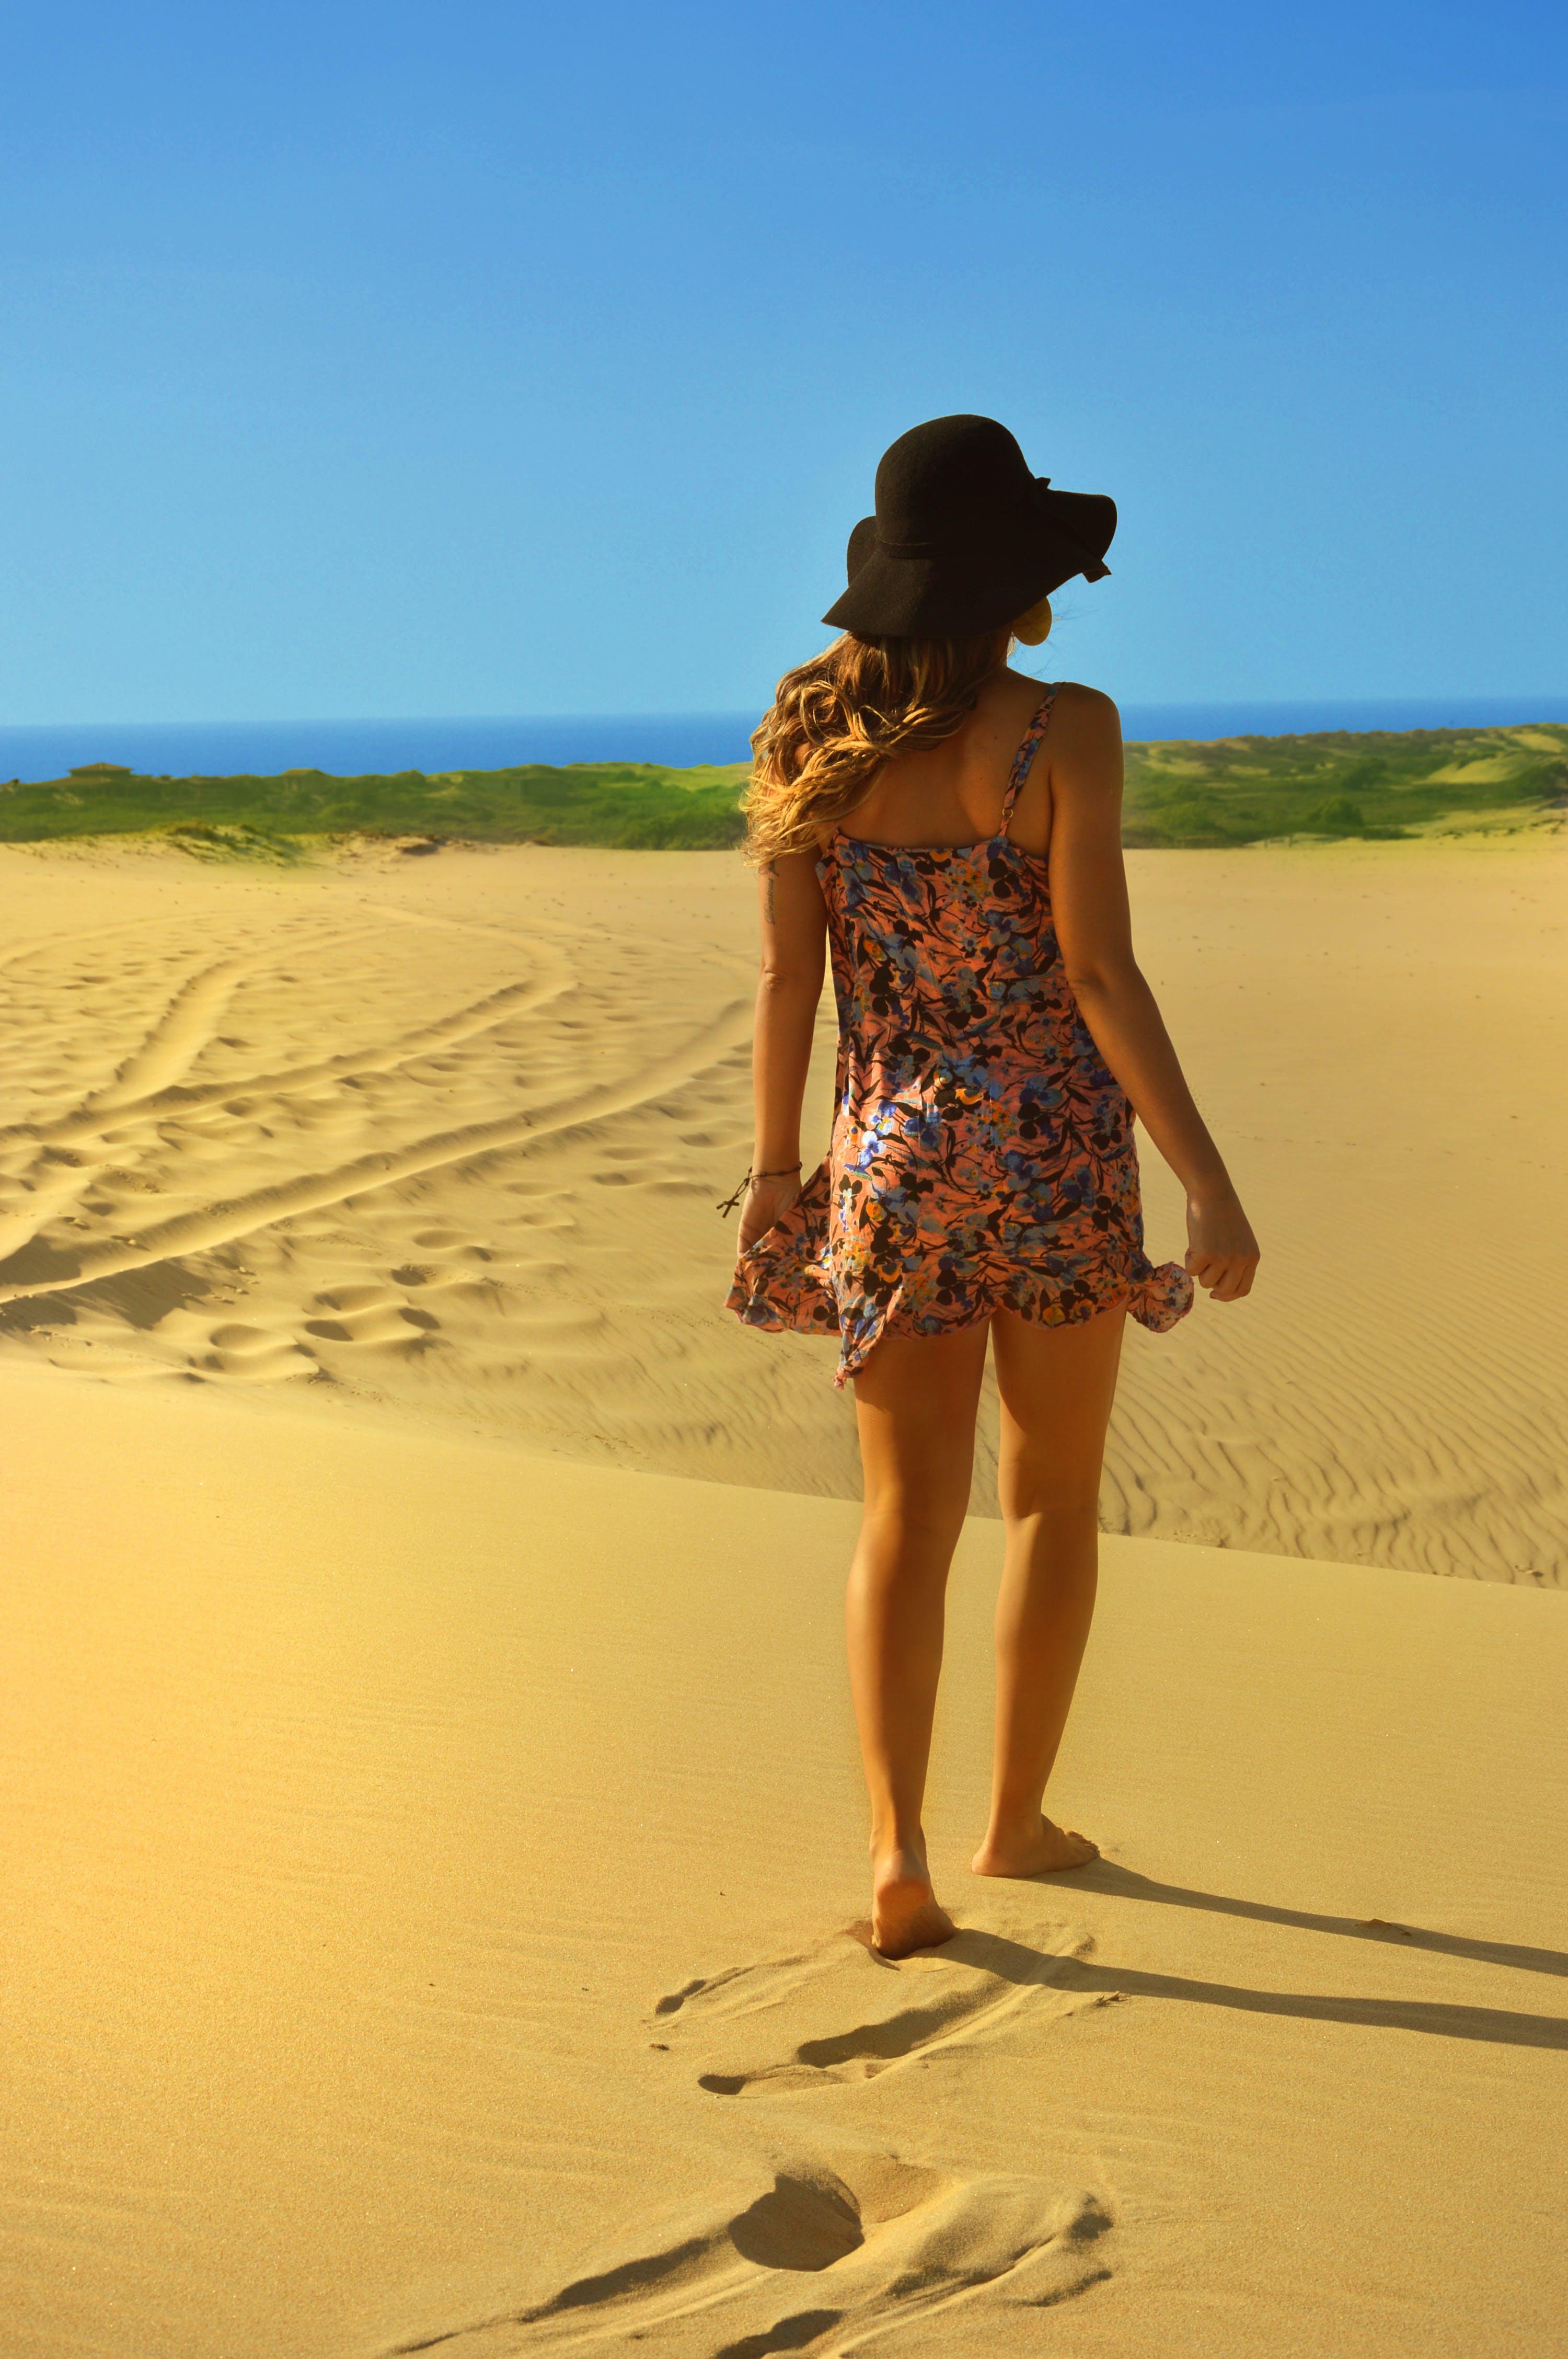 Free stock photo of fashion, beach, sand, woman